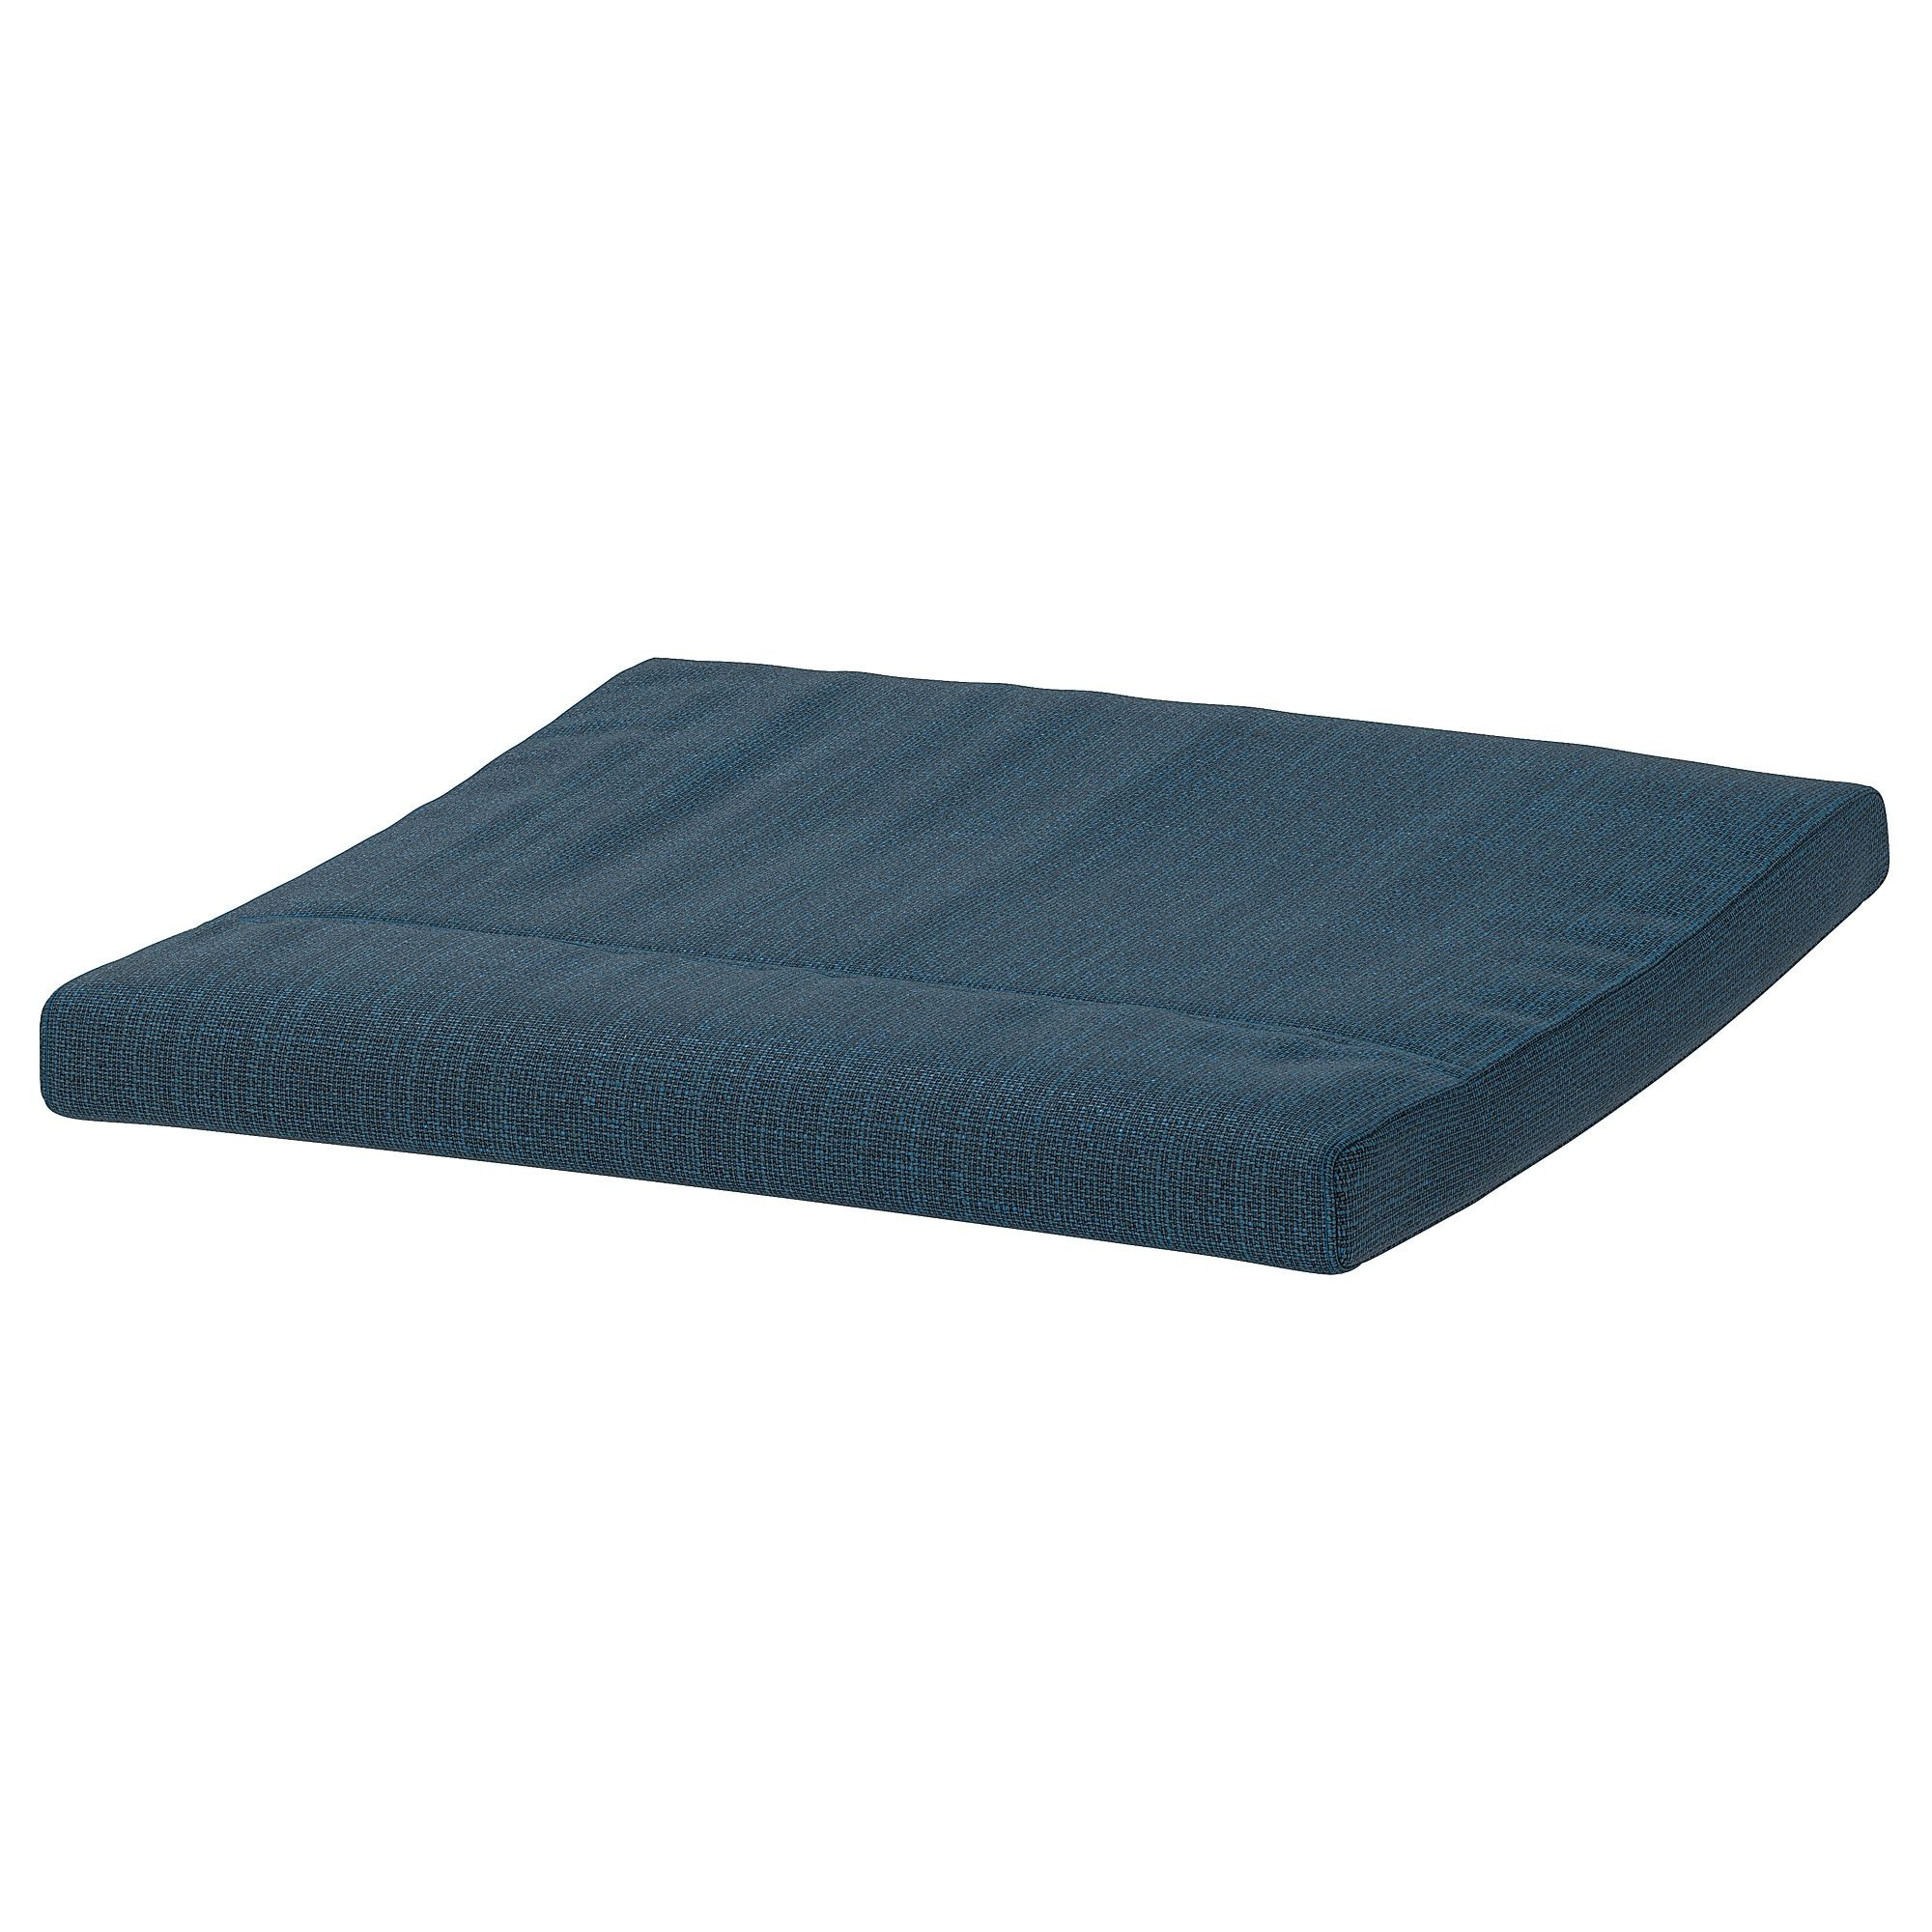 Ikea Poang Footstool Cushion Hillared Dark Blue Cushions